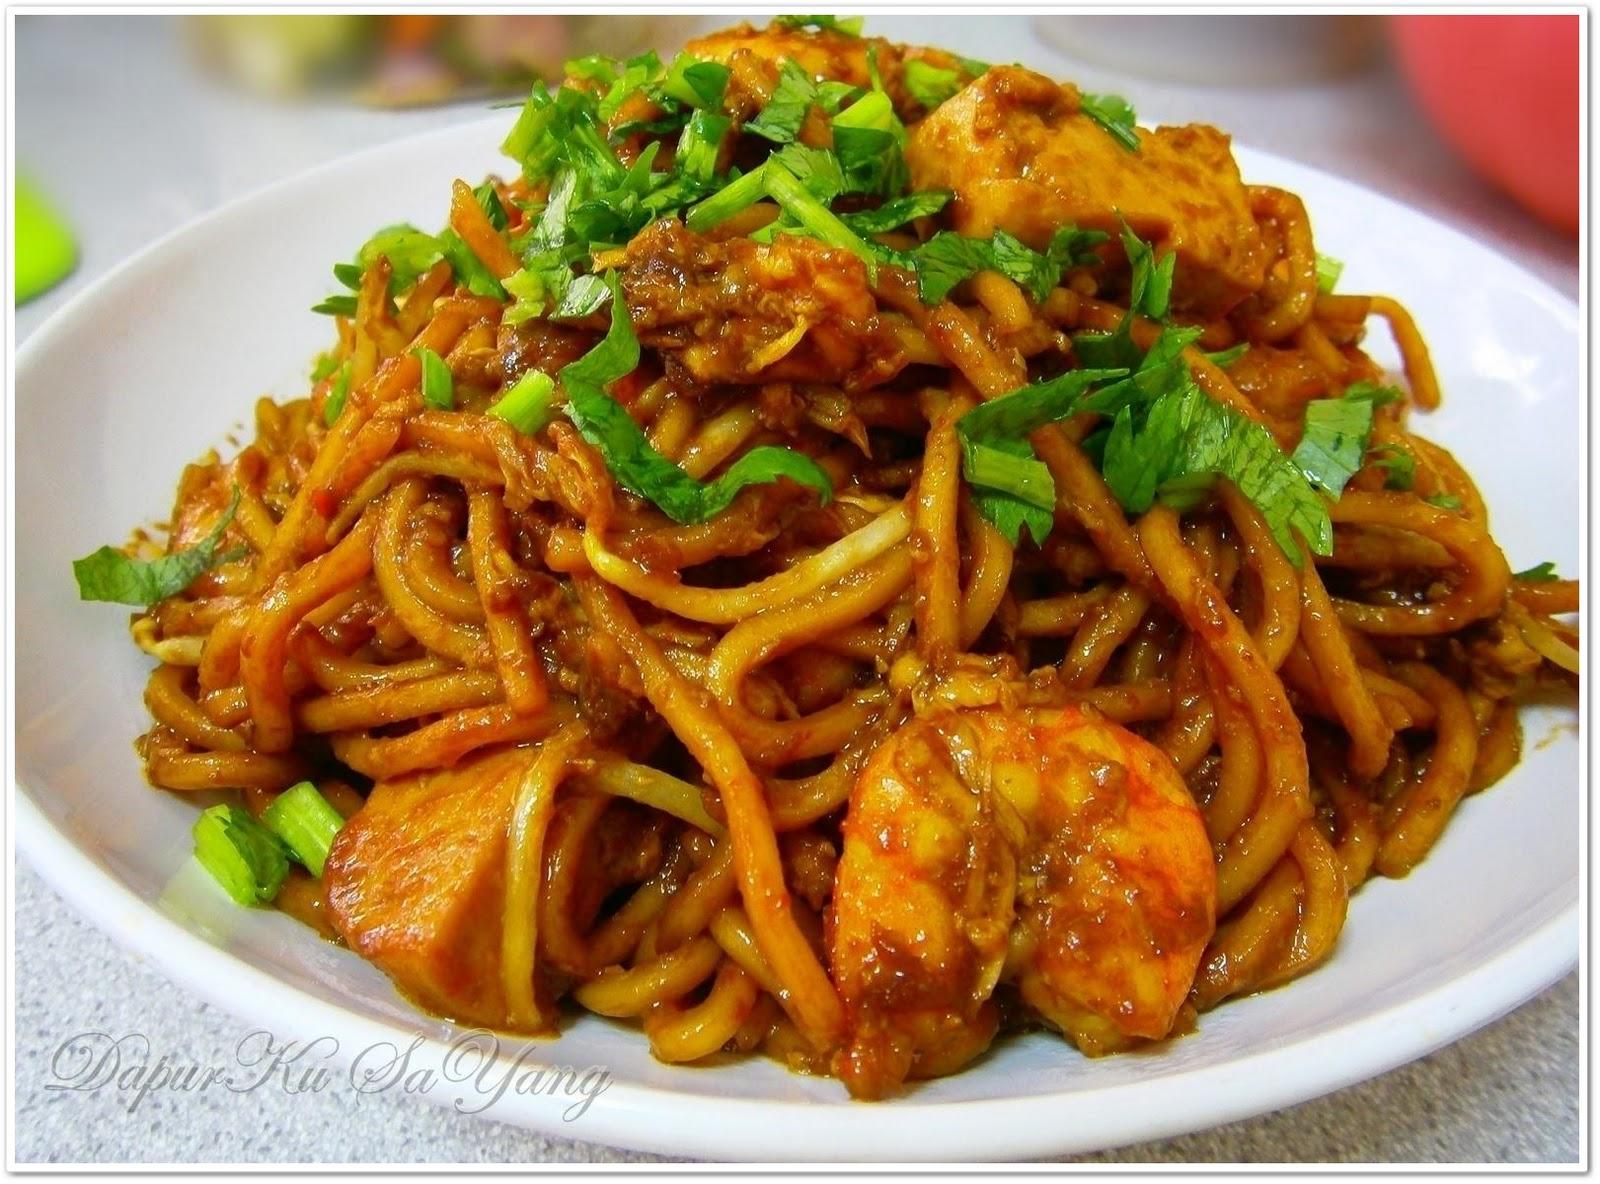 DapurKu SaYang: Mi Goreng (my style)